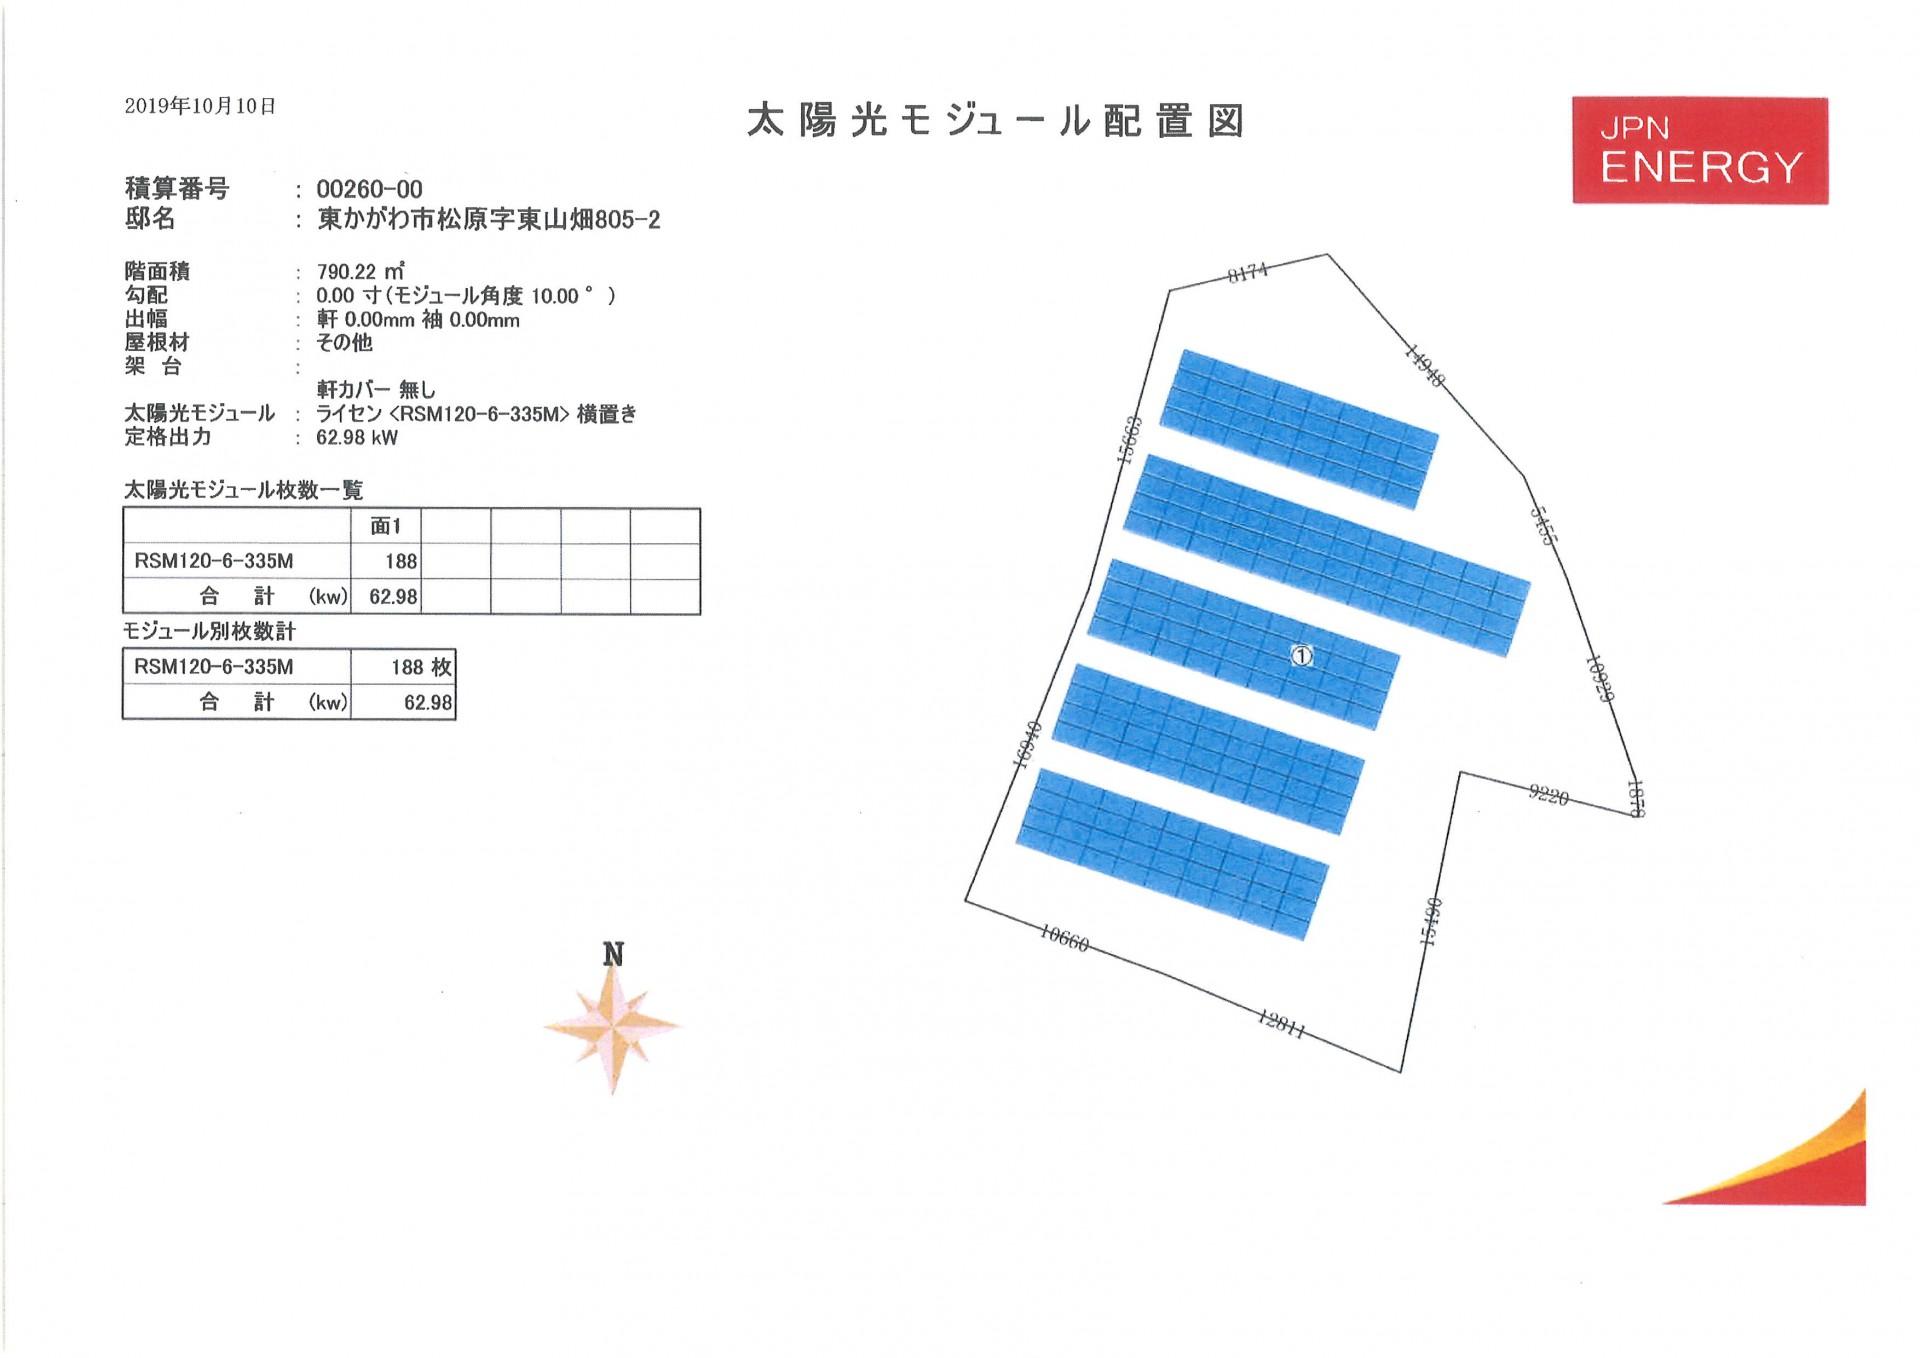 【JPN】G175 FIT14円 香川県東かがわ市発電所のメイン画像